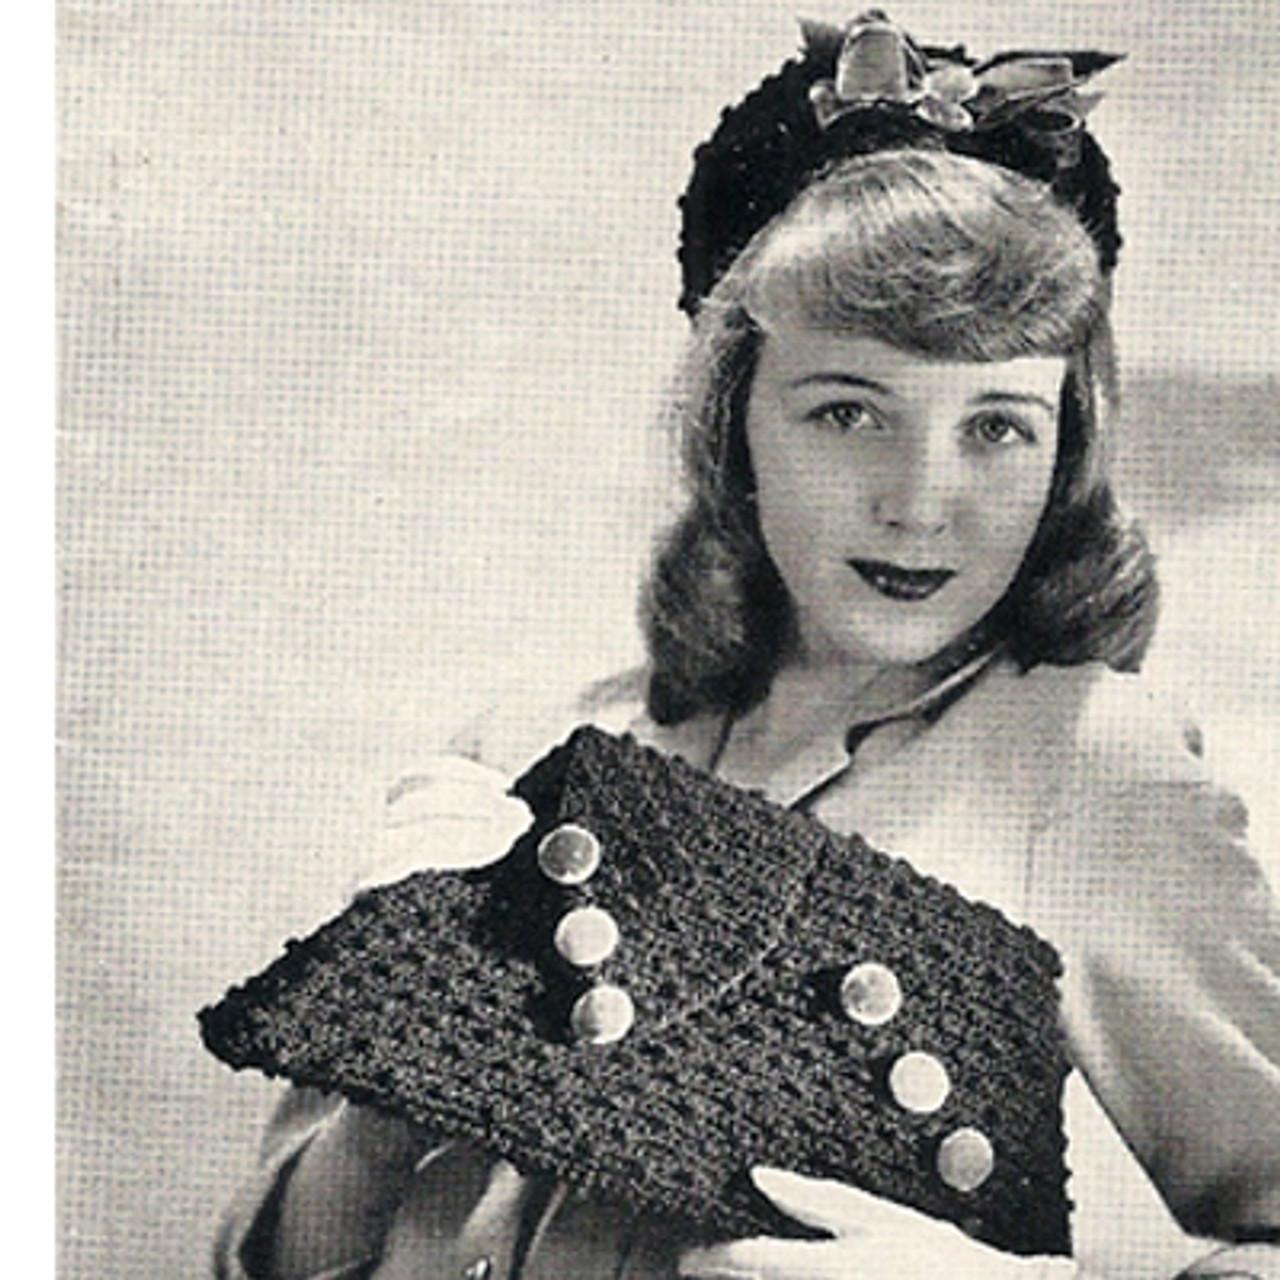 Crochet Calot and Handbag Pattern, Spool Cotton